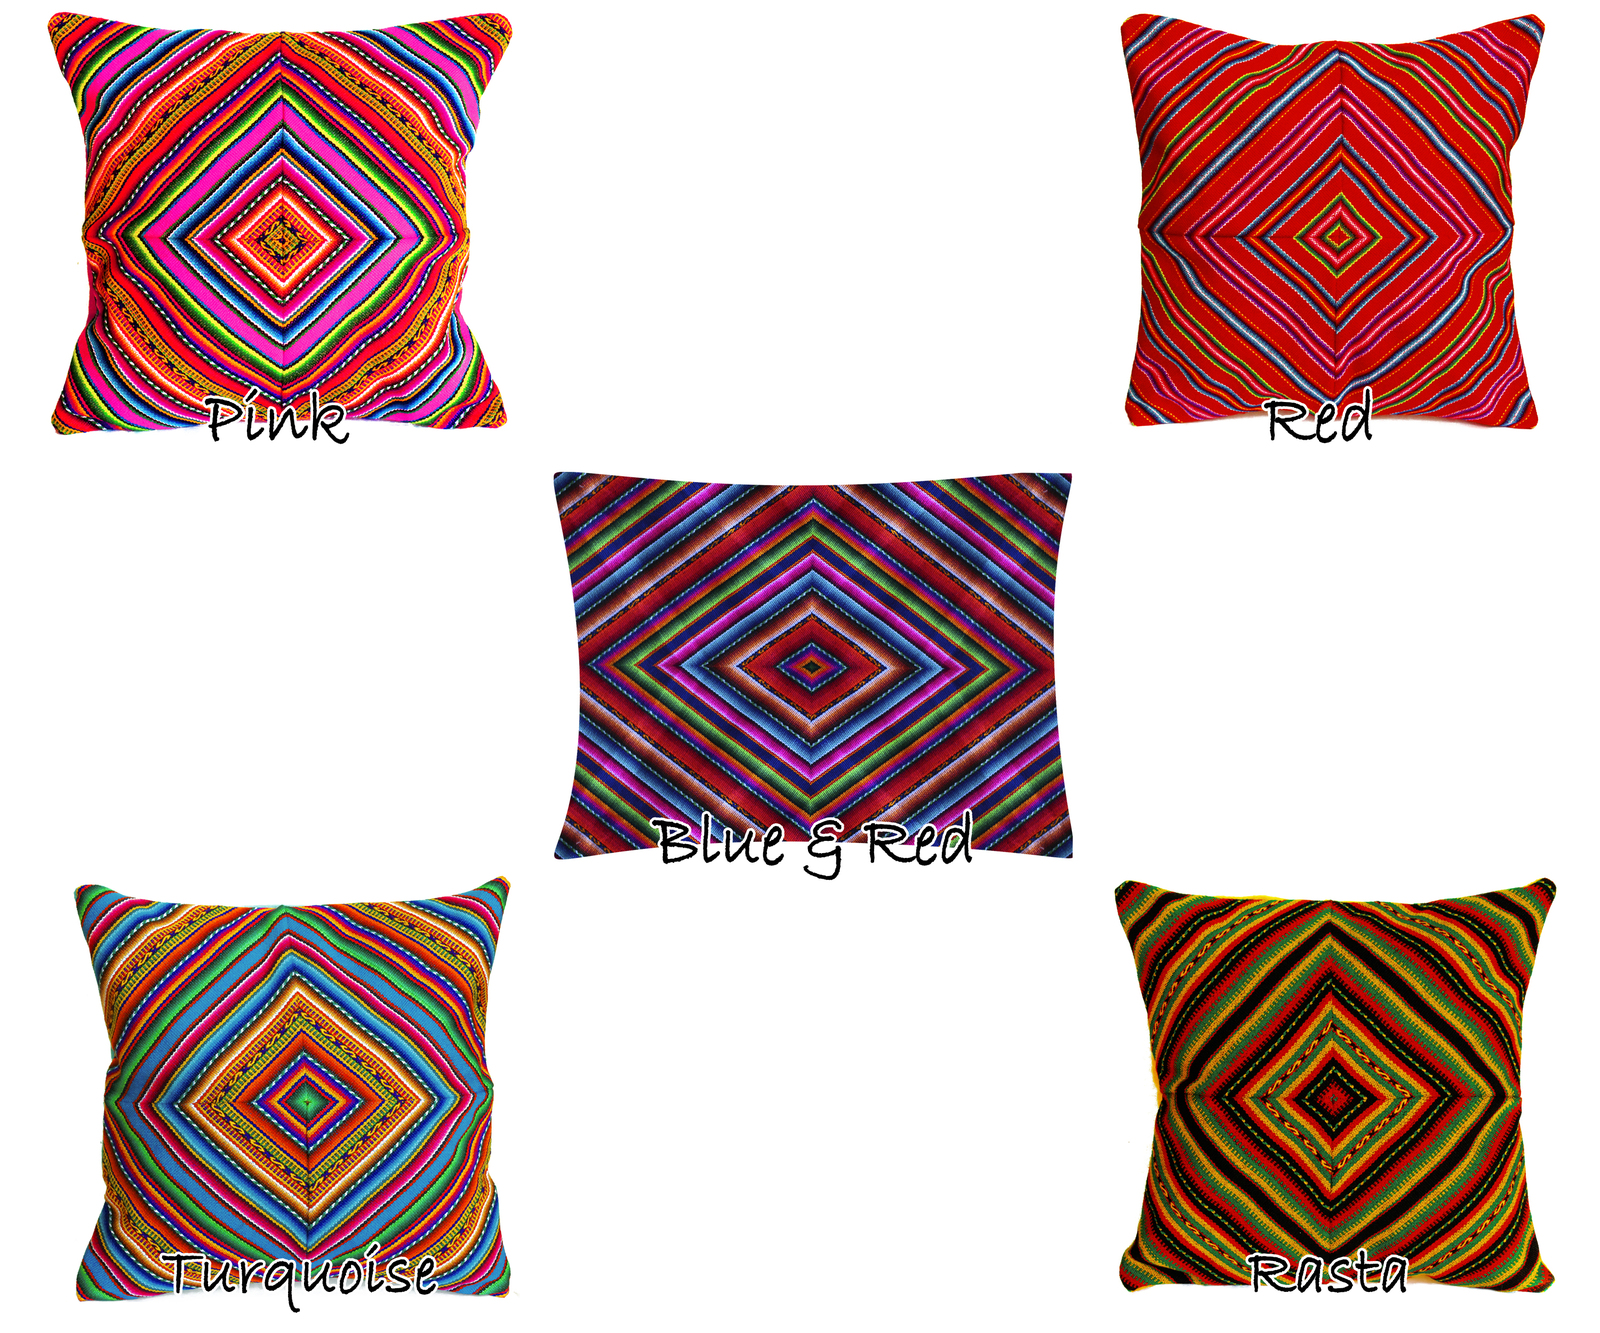 Rainbow PERUVIAN Cushion Cover, throw pillow, ethnic cushion, boho decor image 5